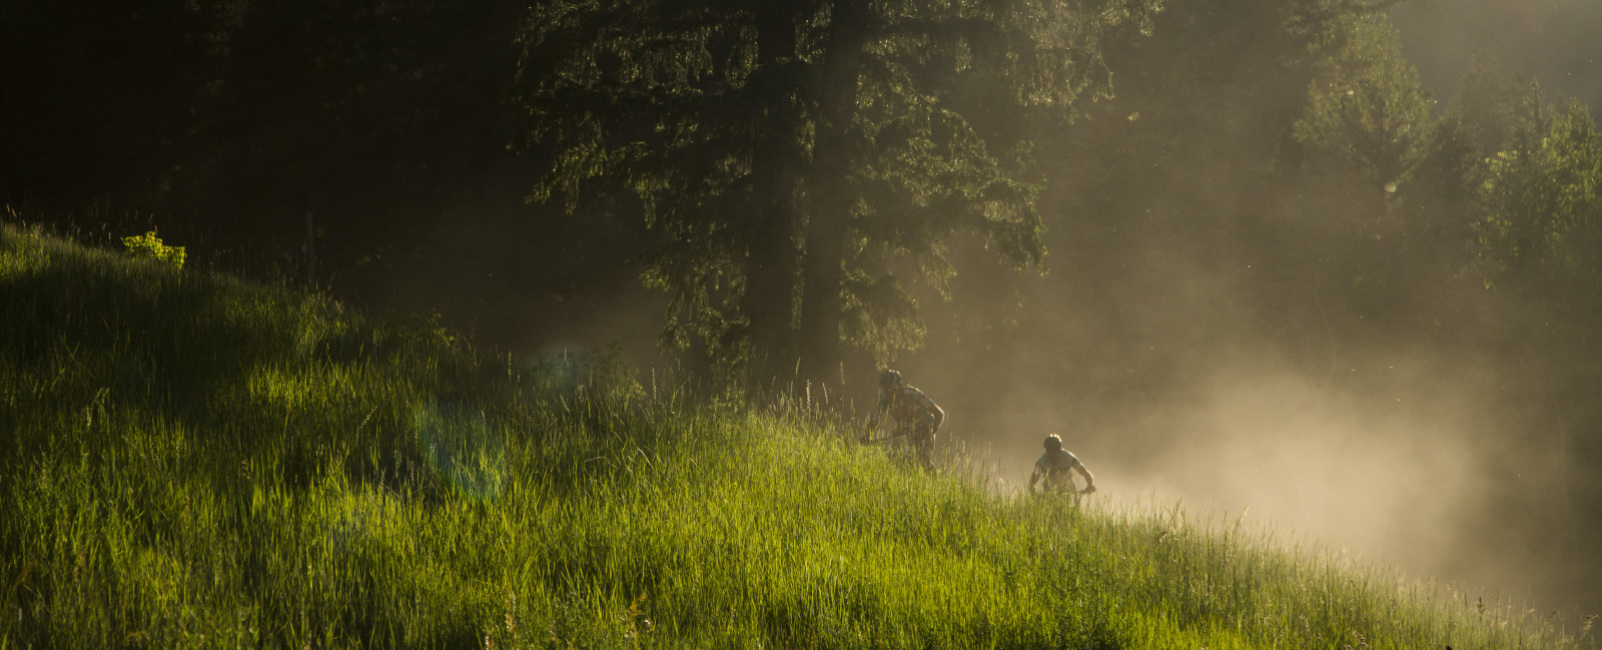 Guide to Mountain Biking at Sundance Resort